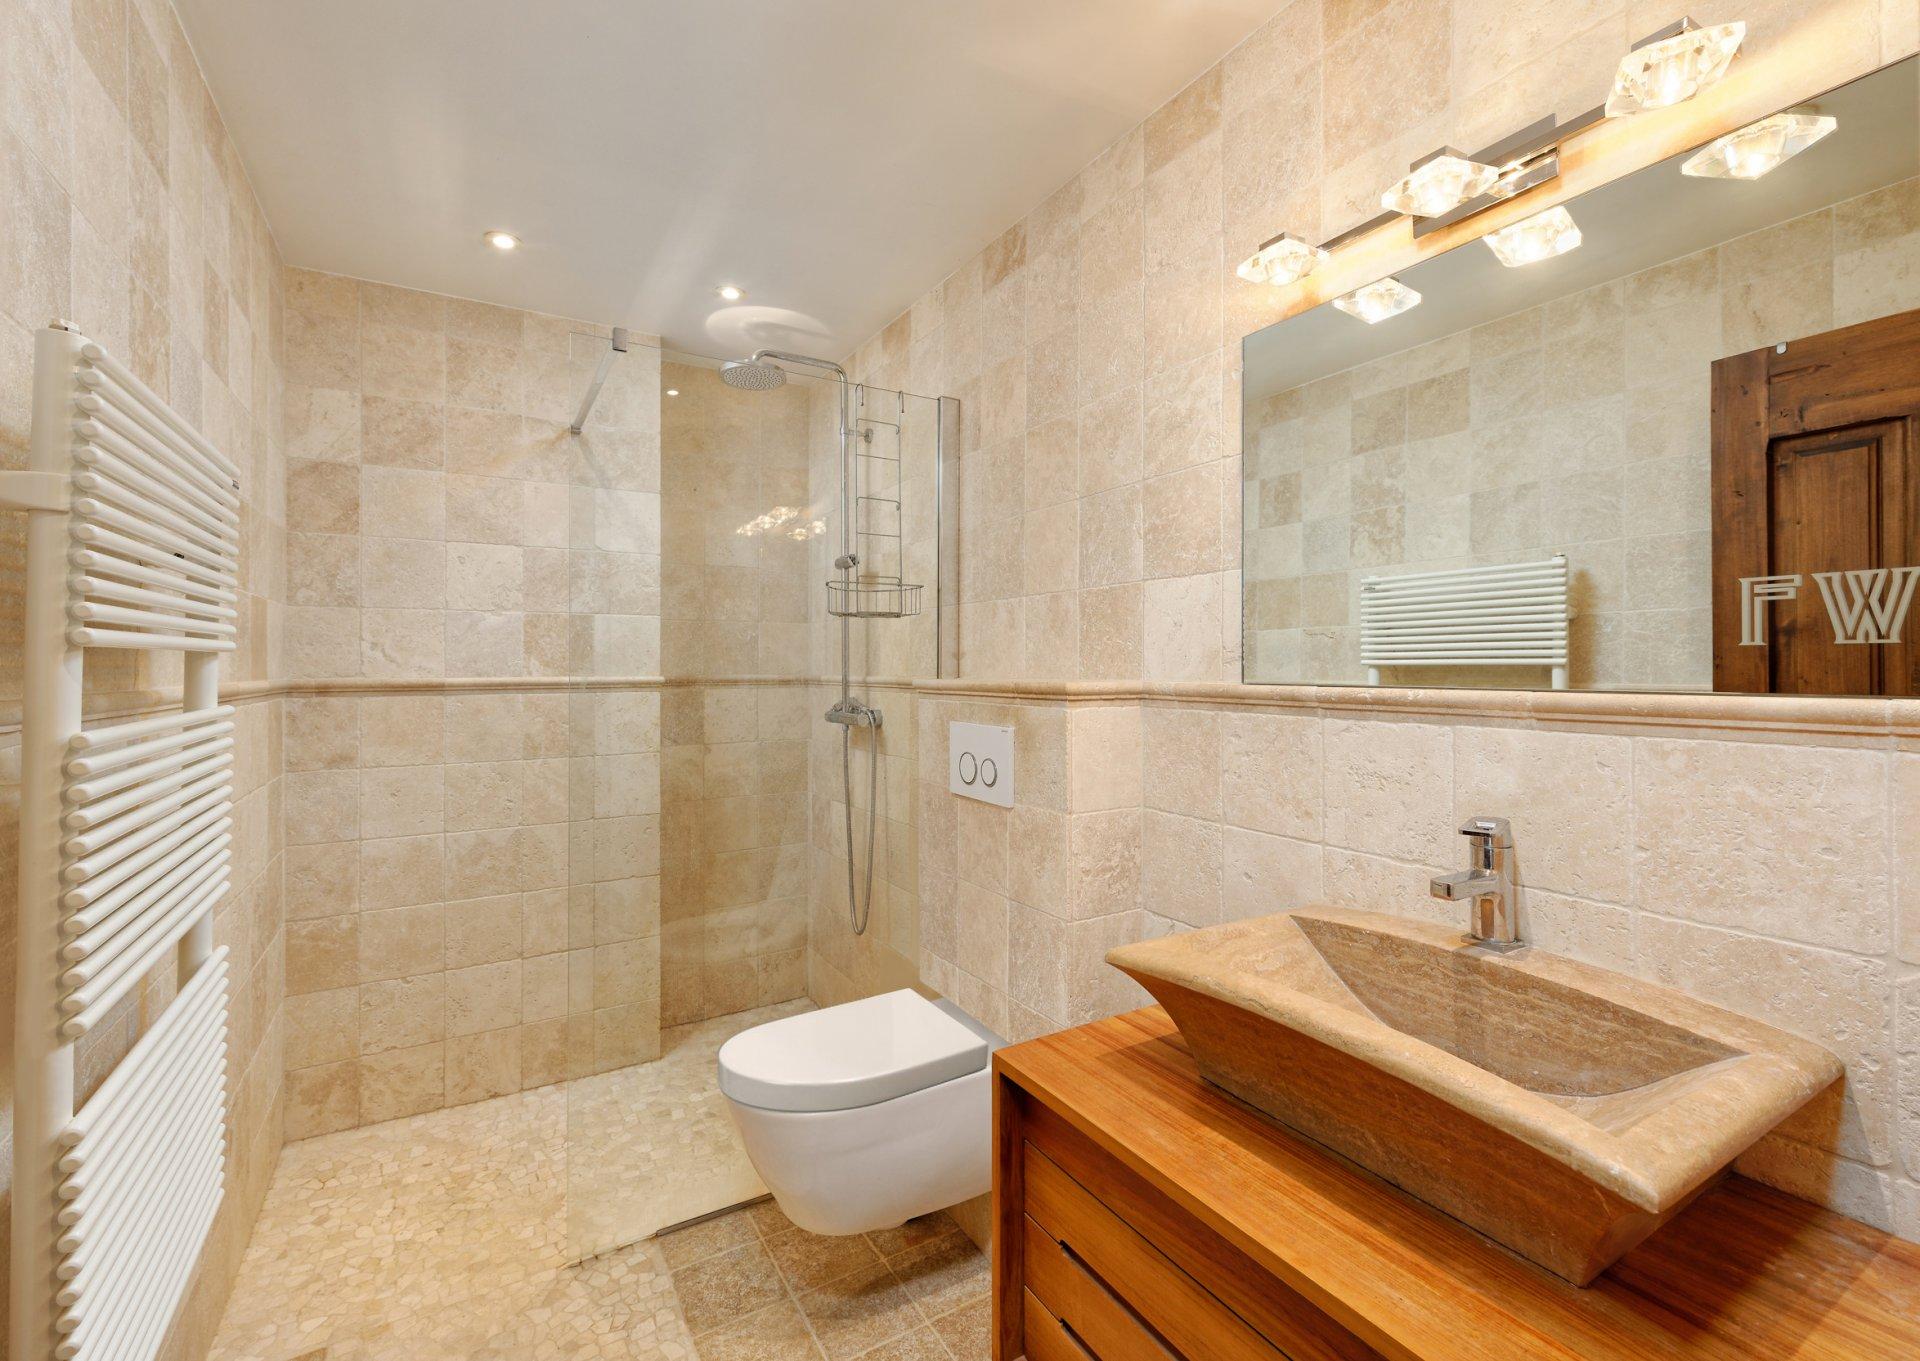 Grasse villa individuelle 500m² sdd+wc